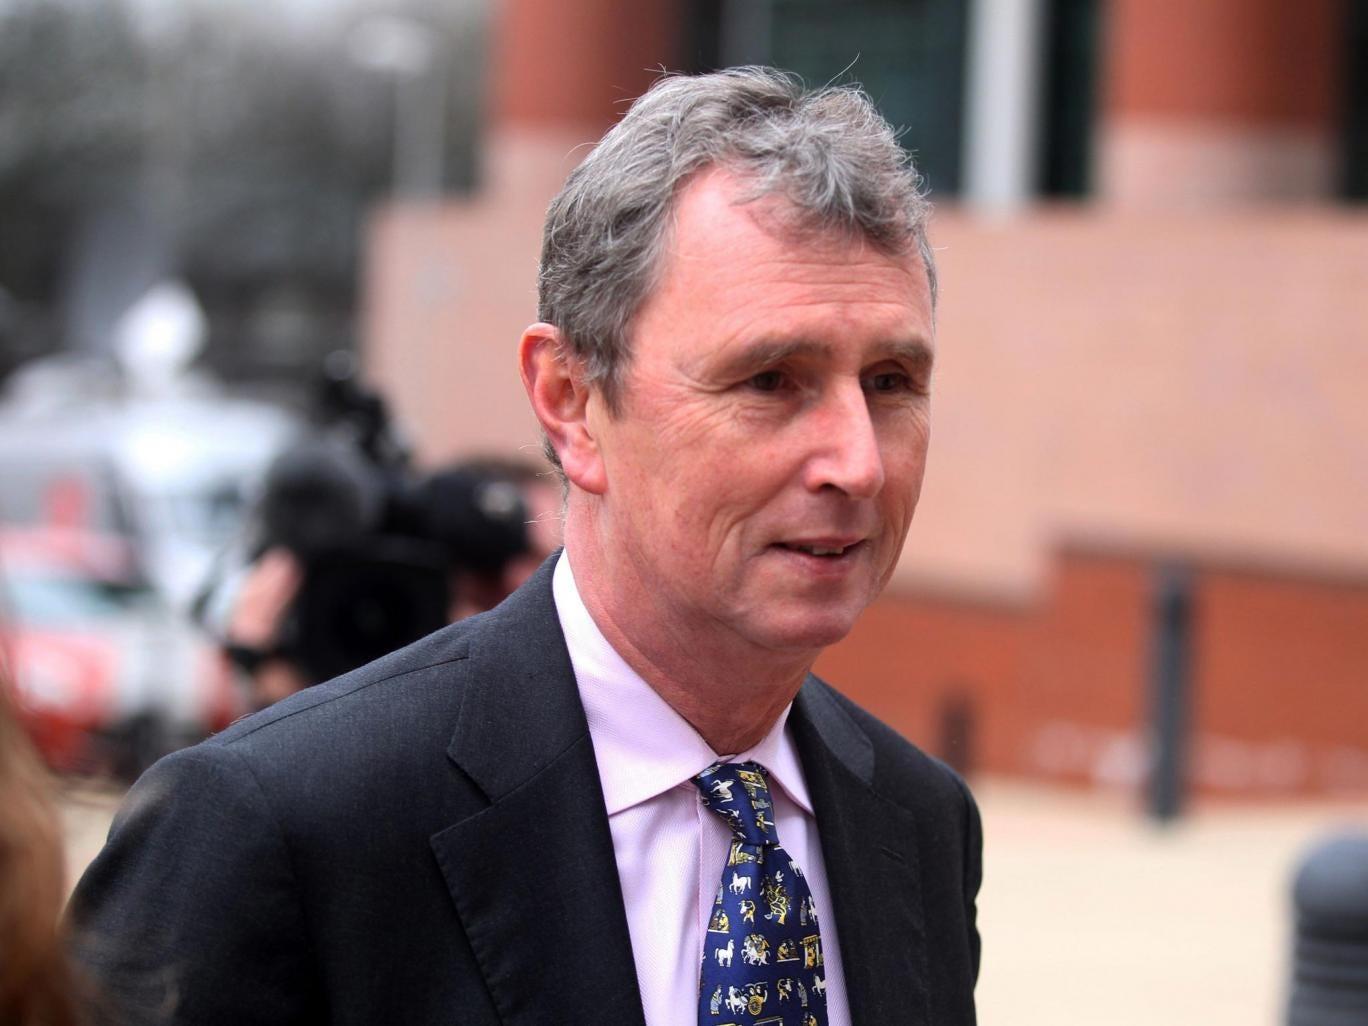 The former deputy speaker of the House of Commons Nigel Evans arrives at court